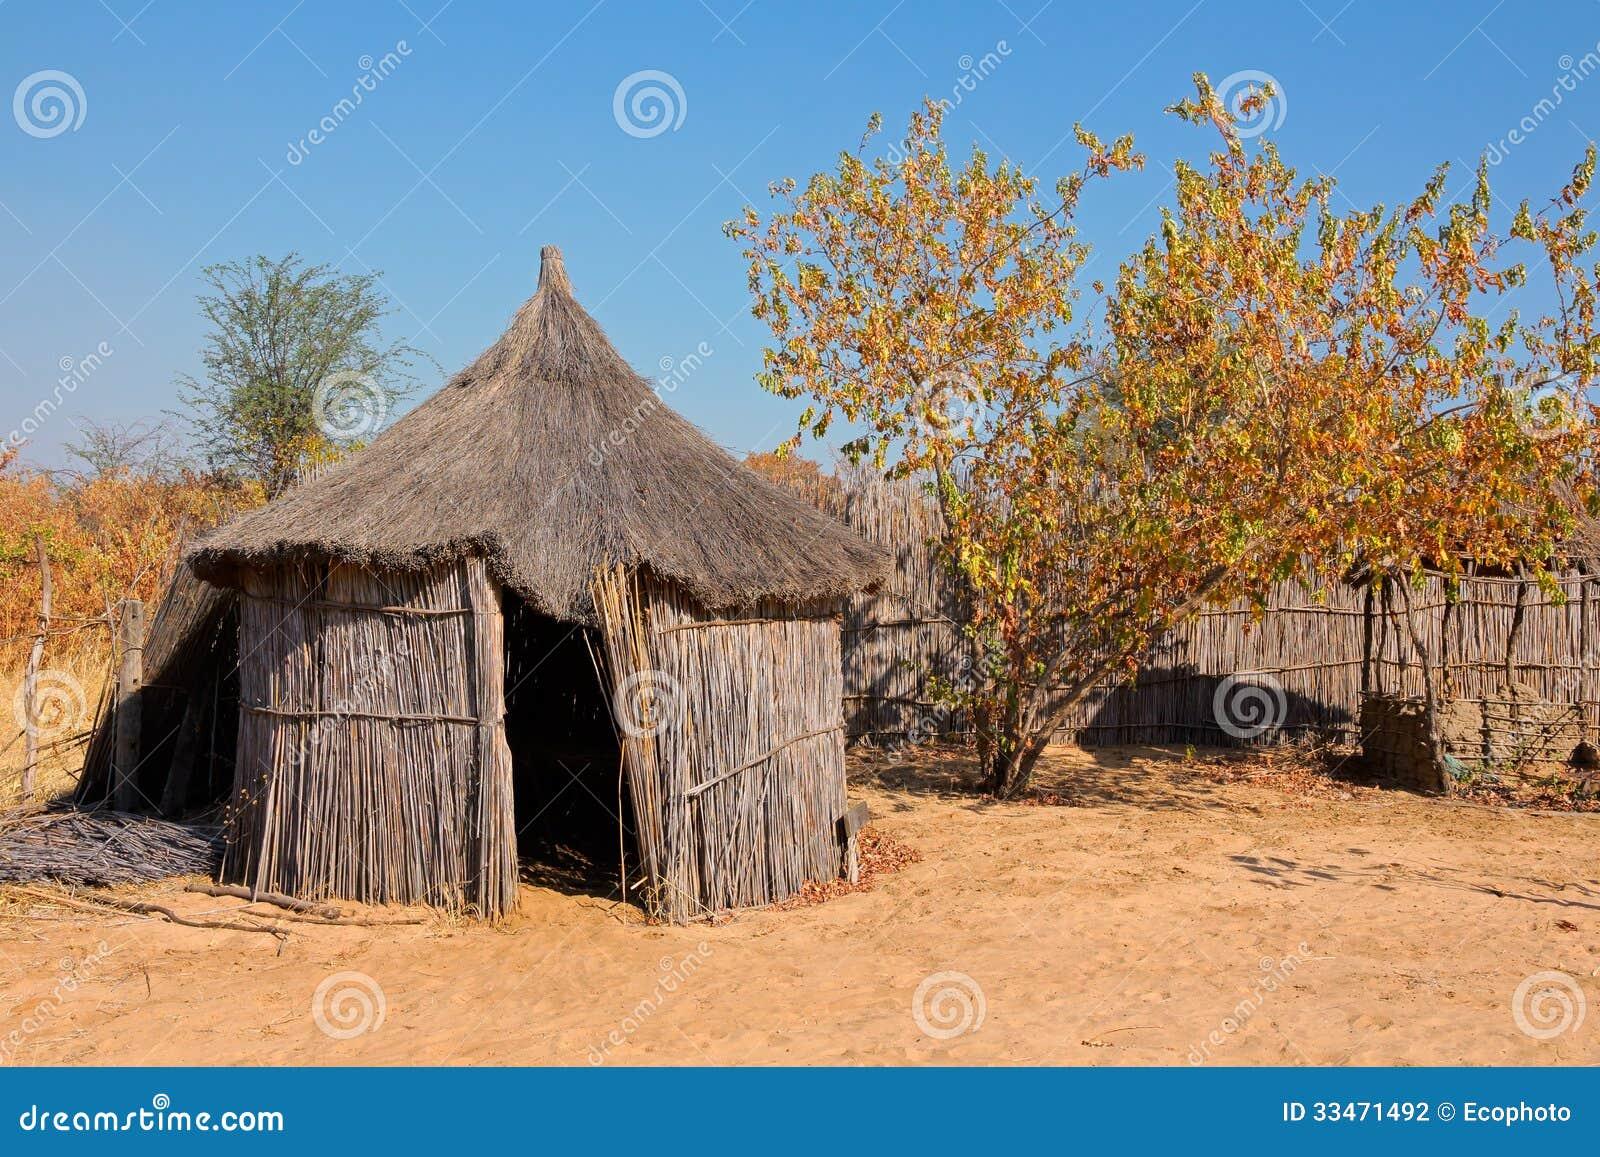 Rural african hut stock photography image 33471492 for Pianeta casa